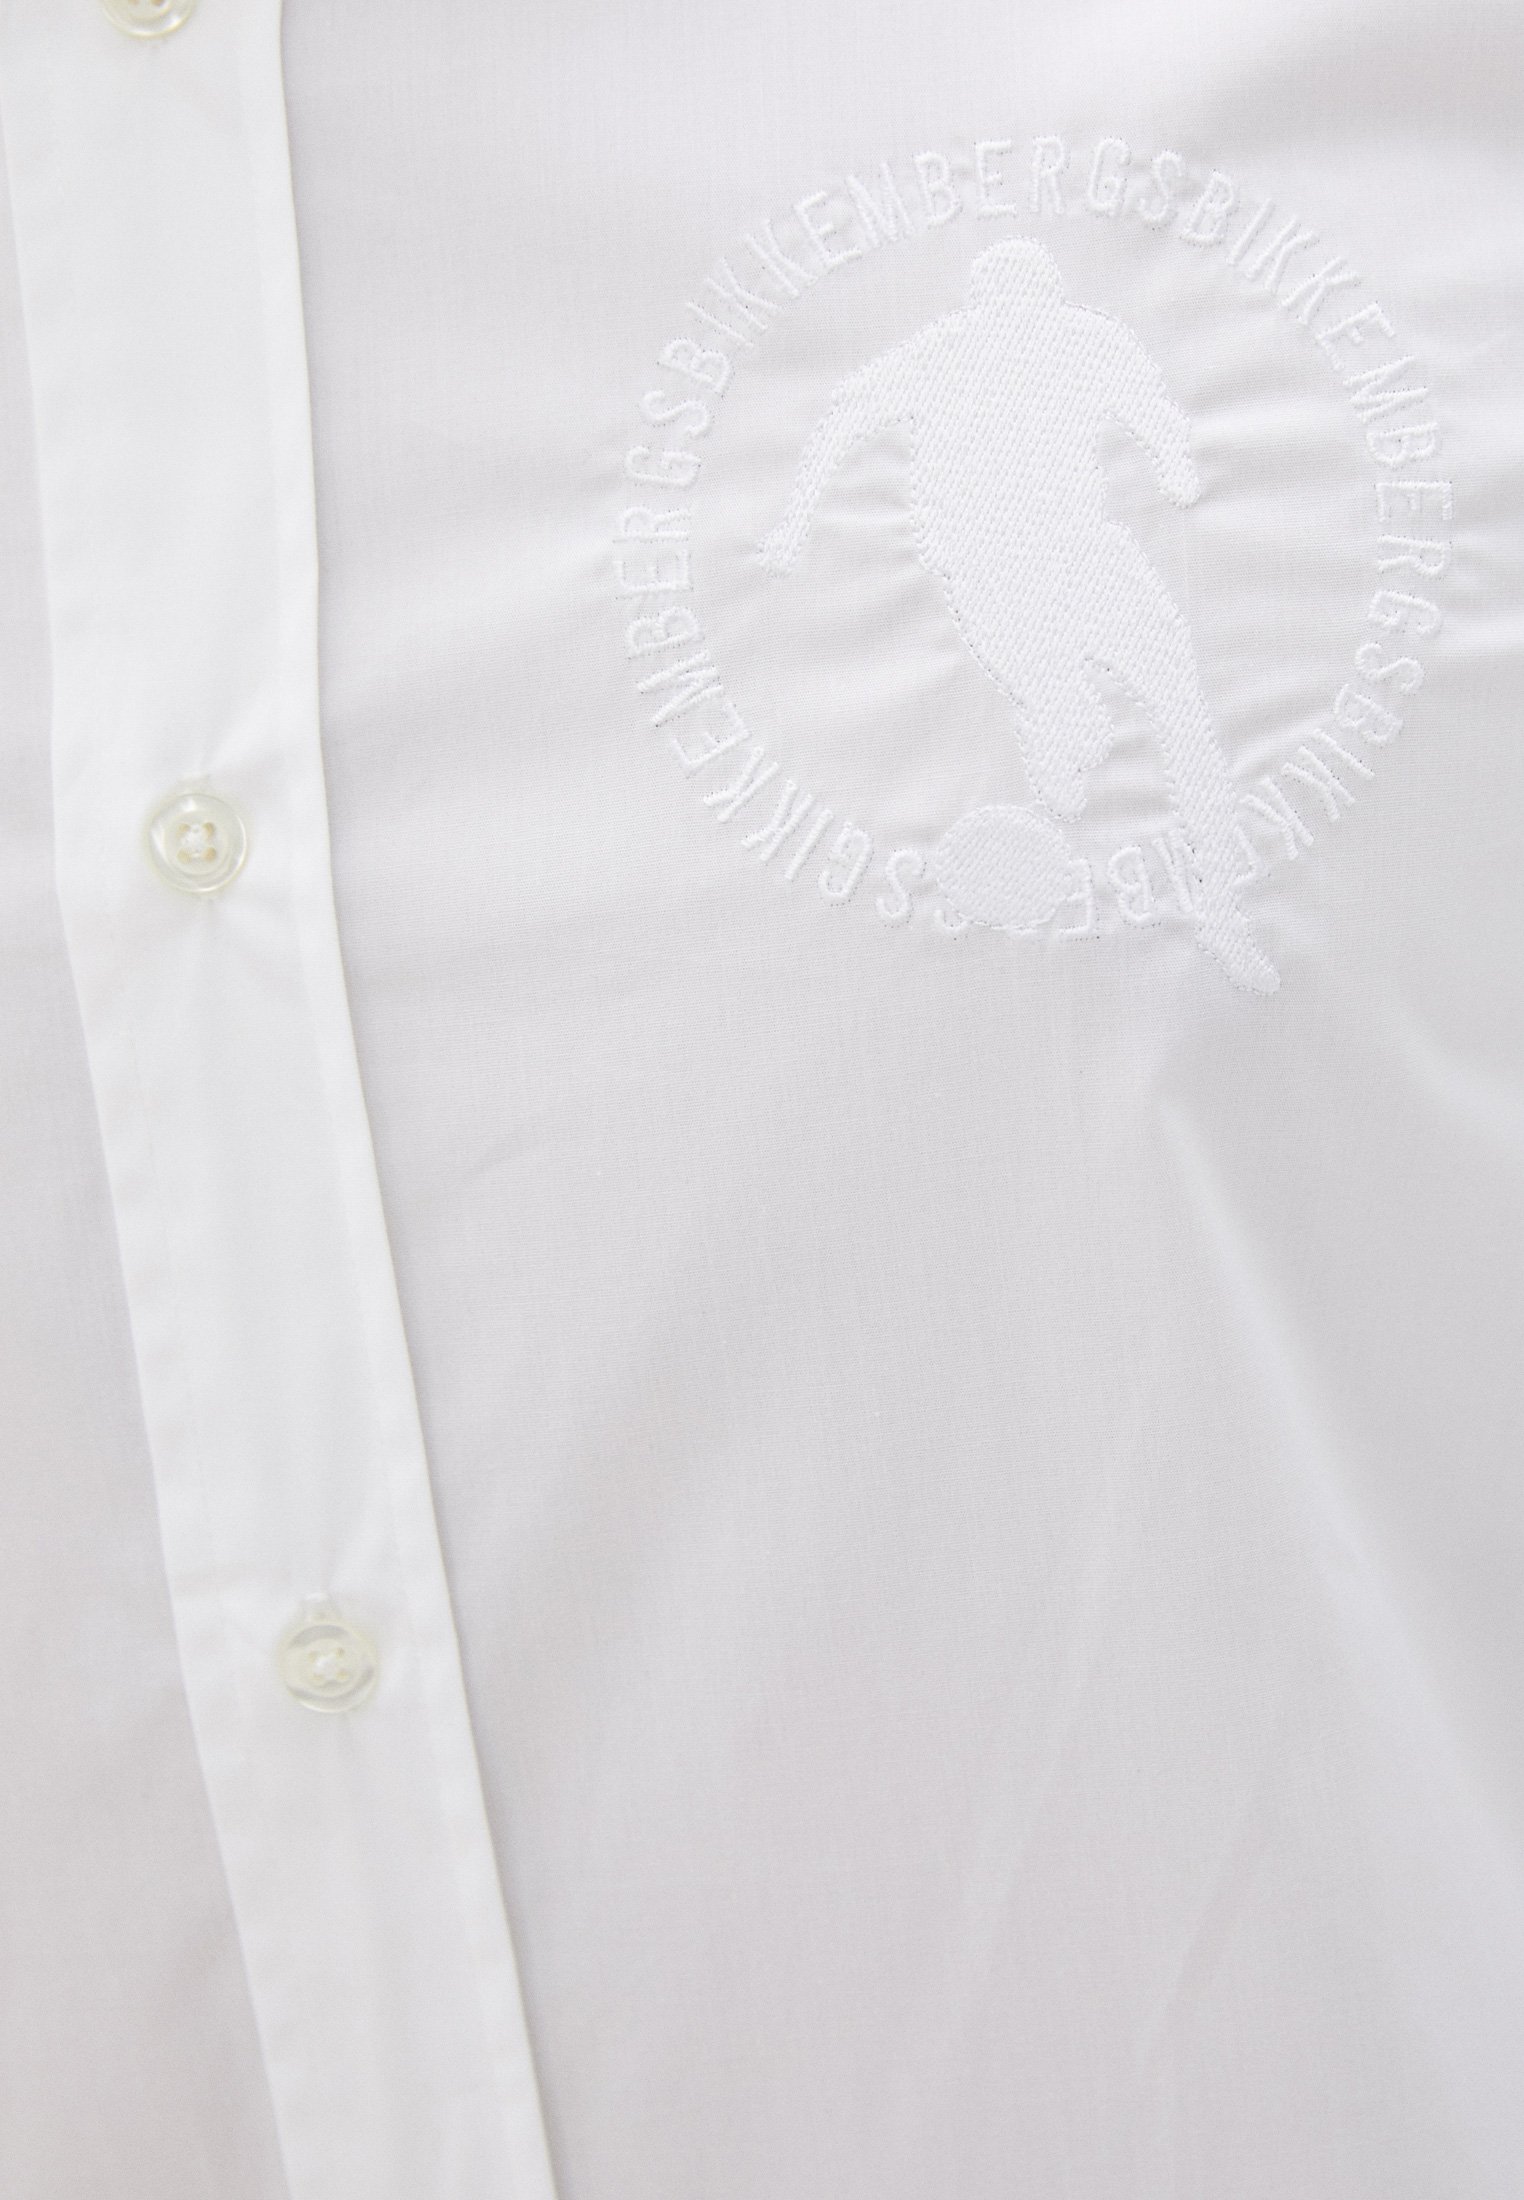 Рубашка с длинным рукавом Bikkembergs (Биккембергс) C C 009 2C S 2931: изображение 5